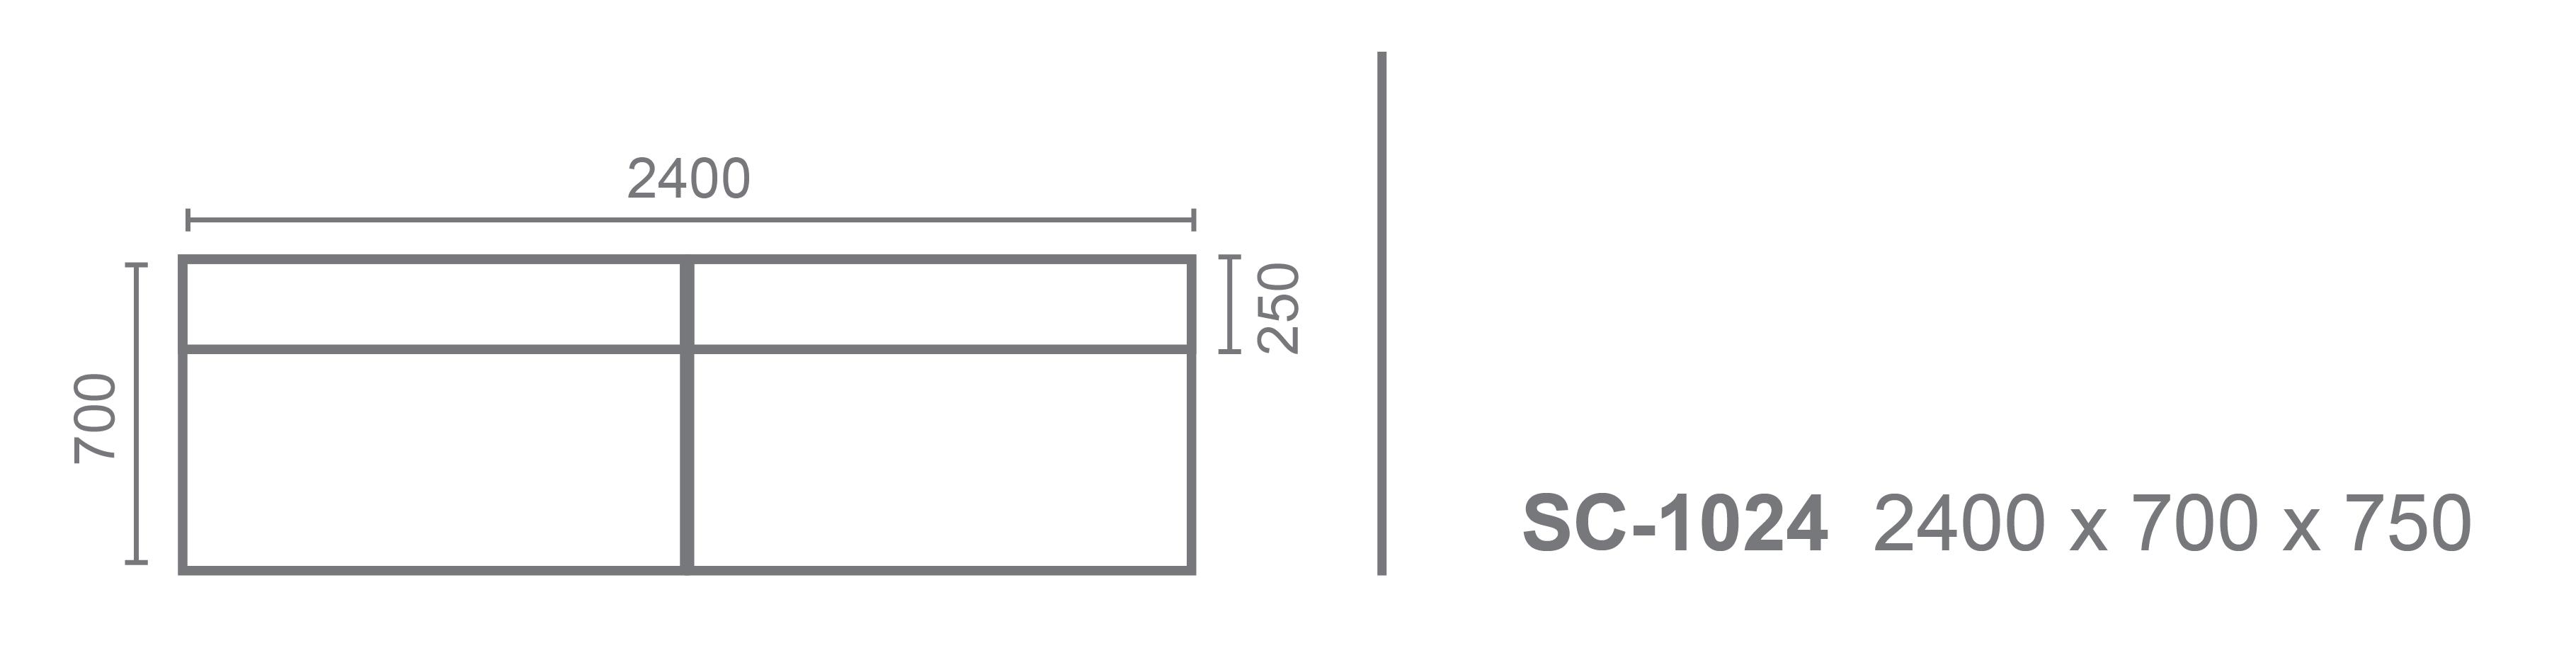 SC-1024